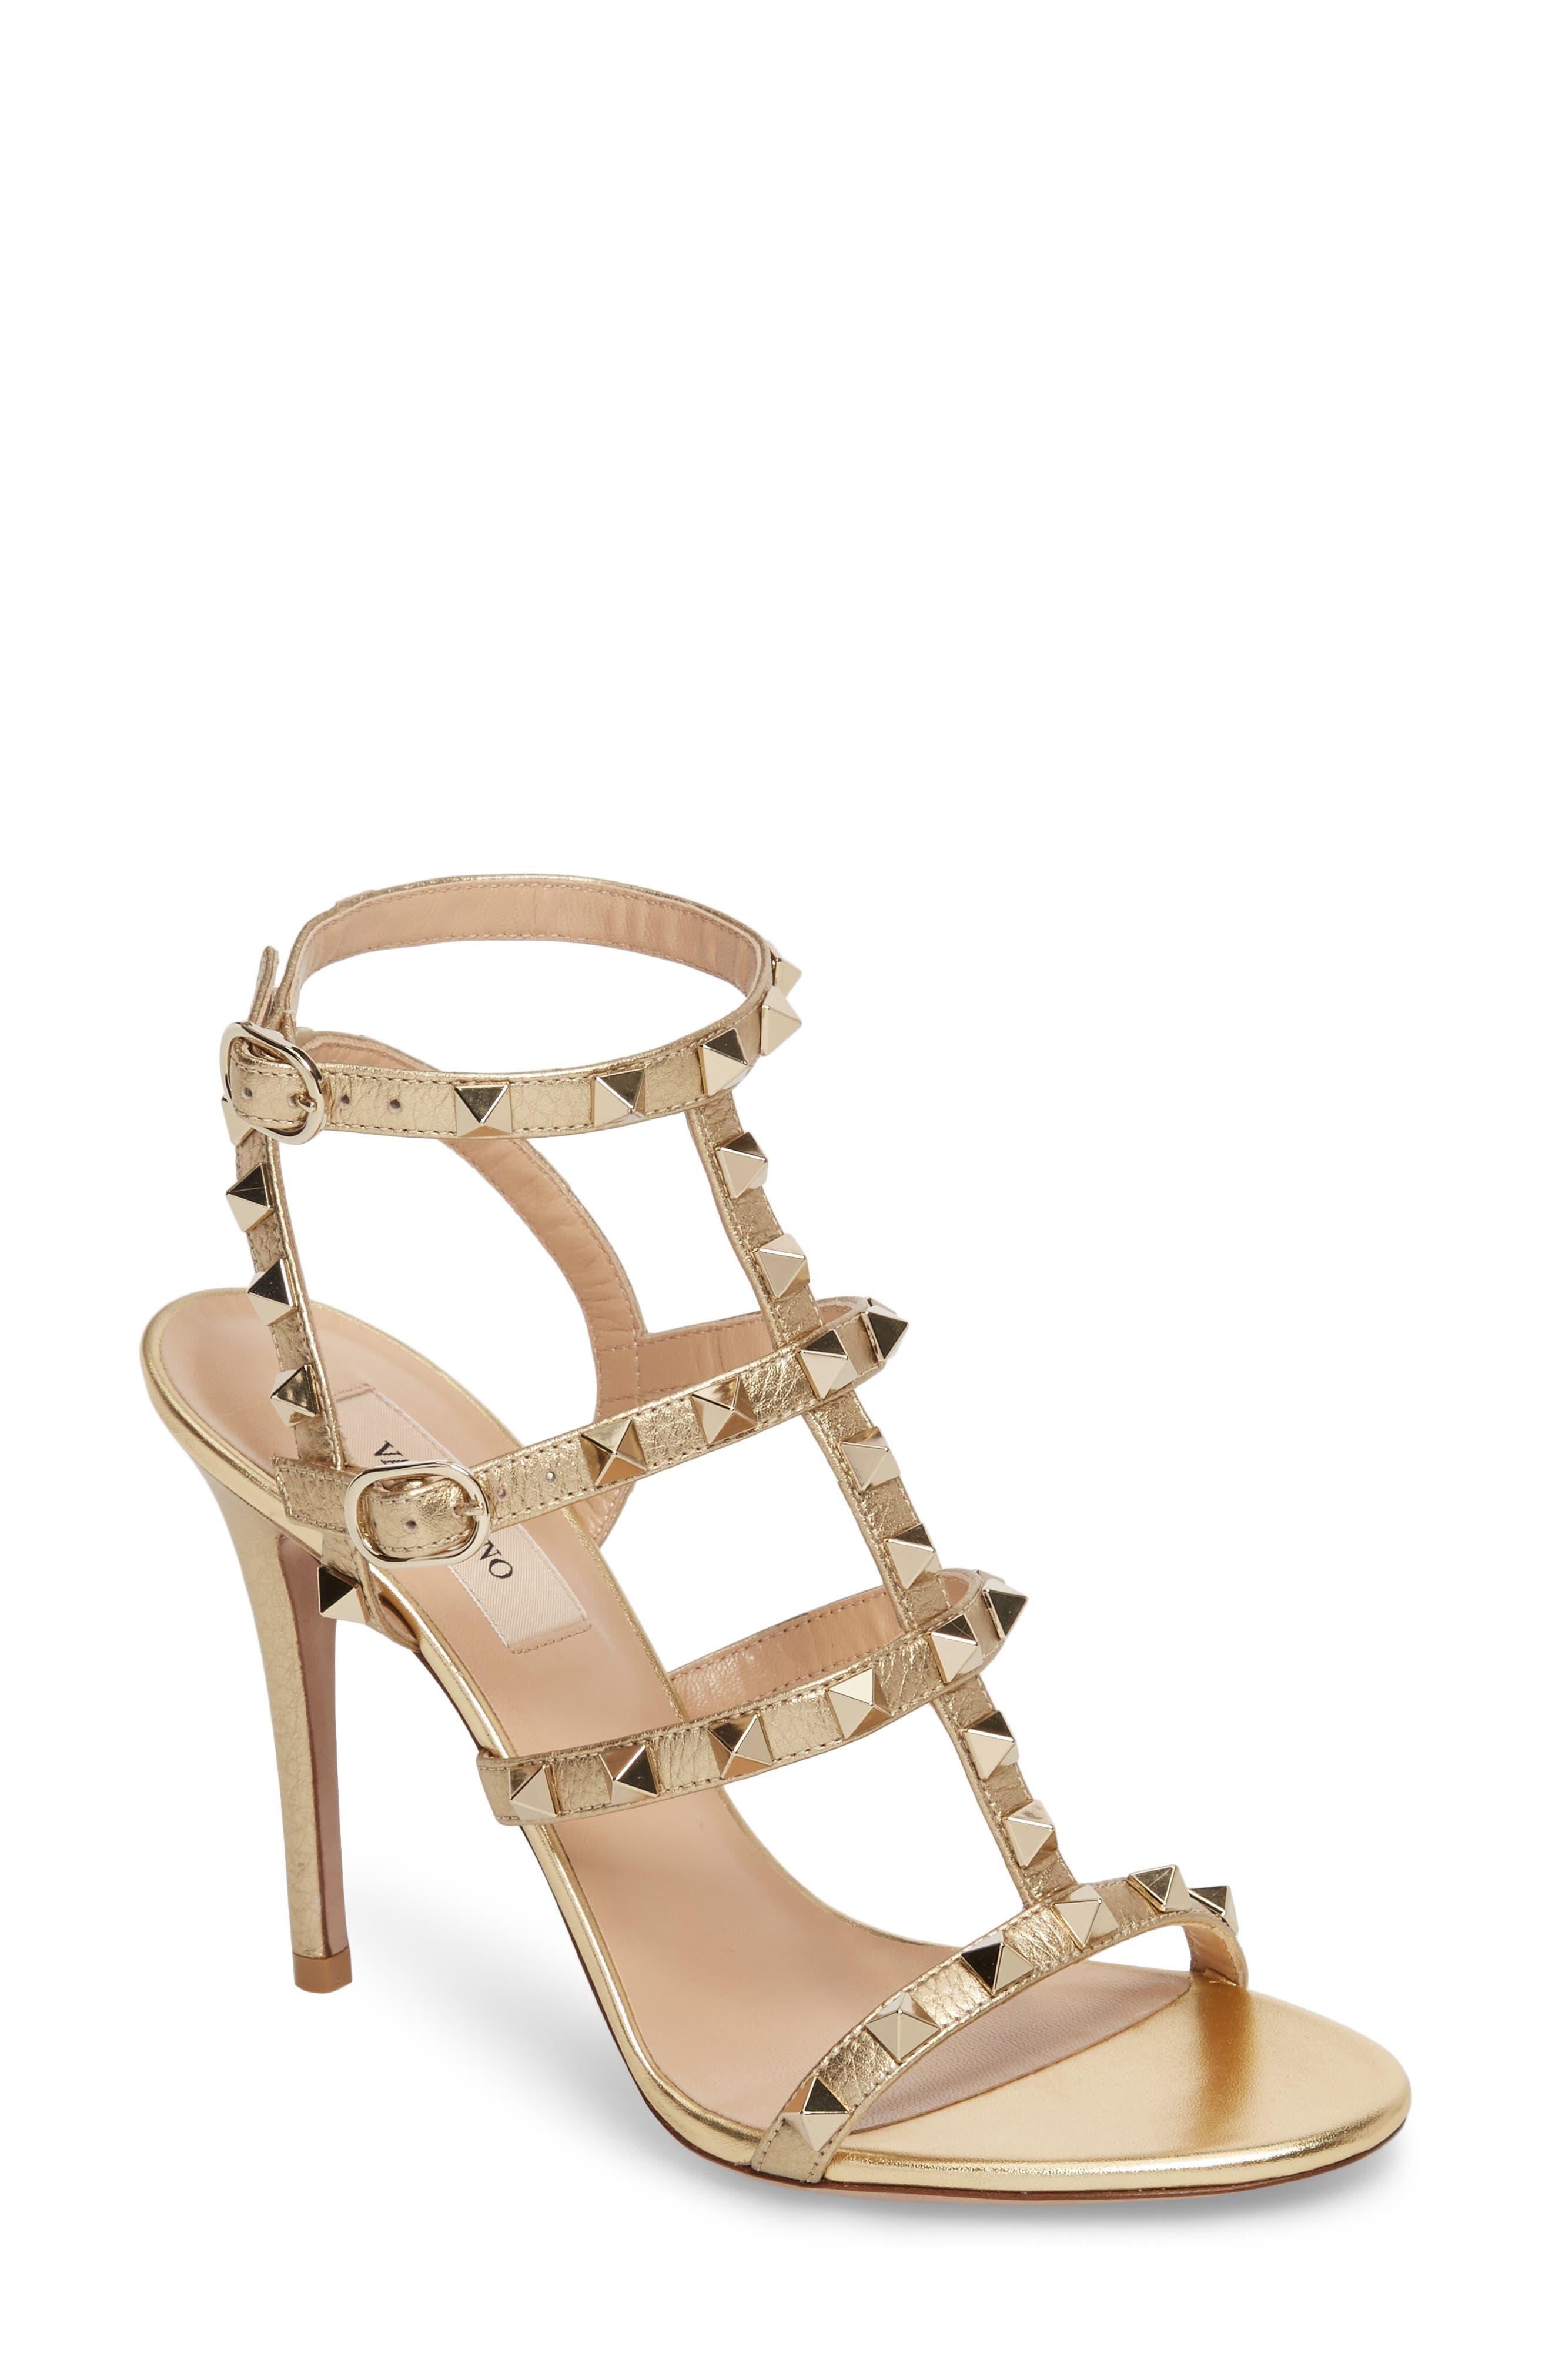 VALENTINO GARAVANI Rockstud Metallic Ankle Strap Sandal, Main, color, 710